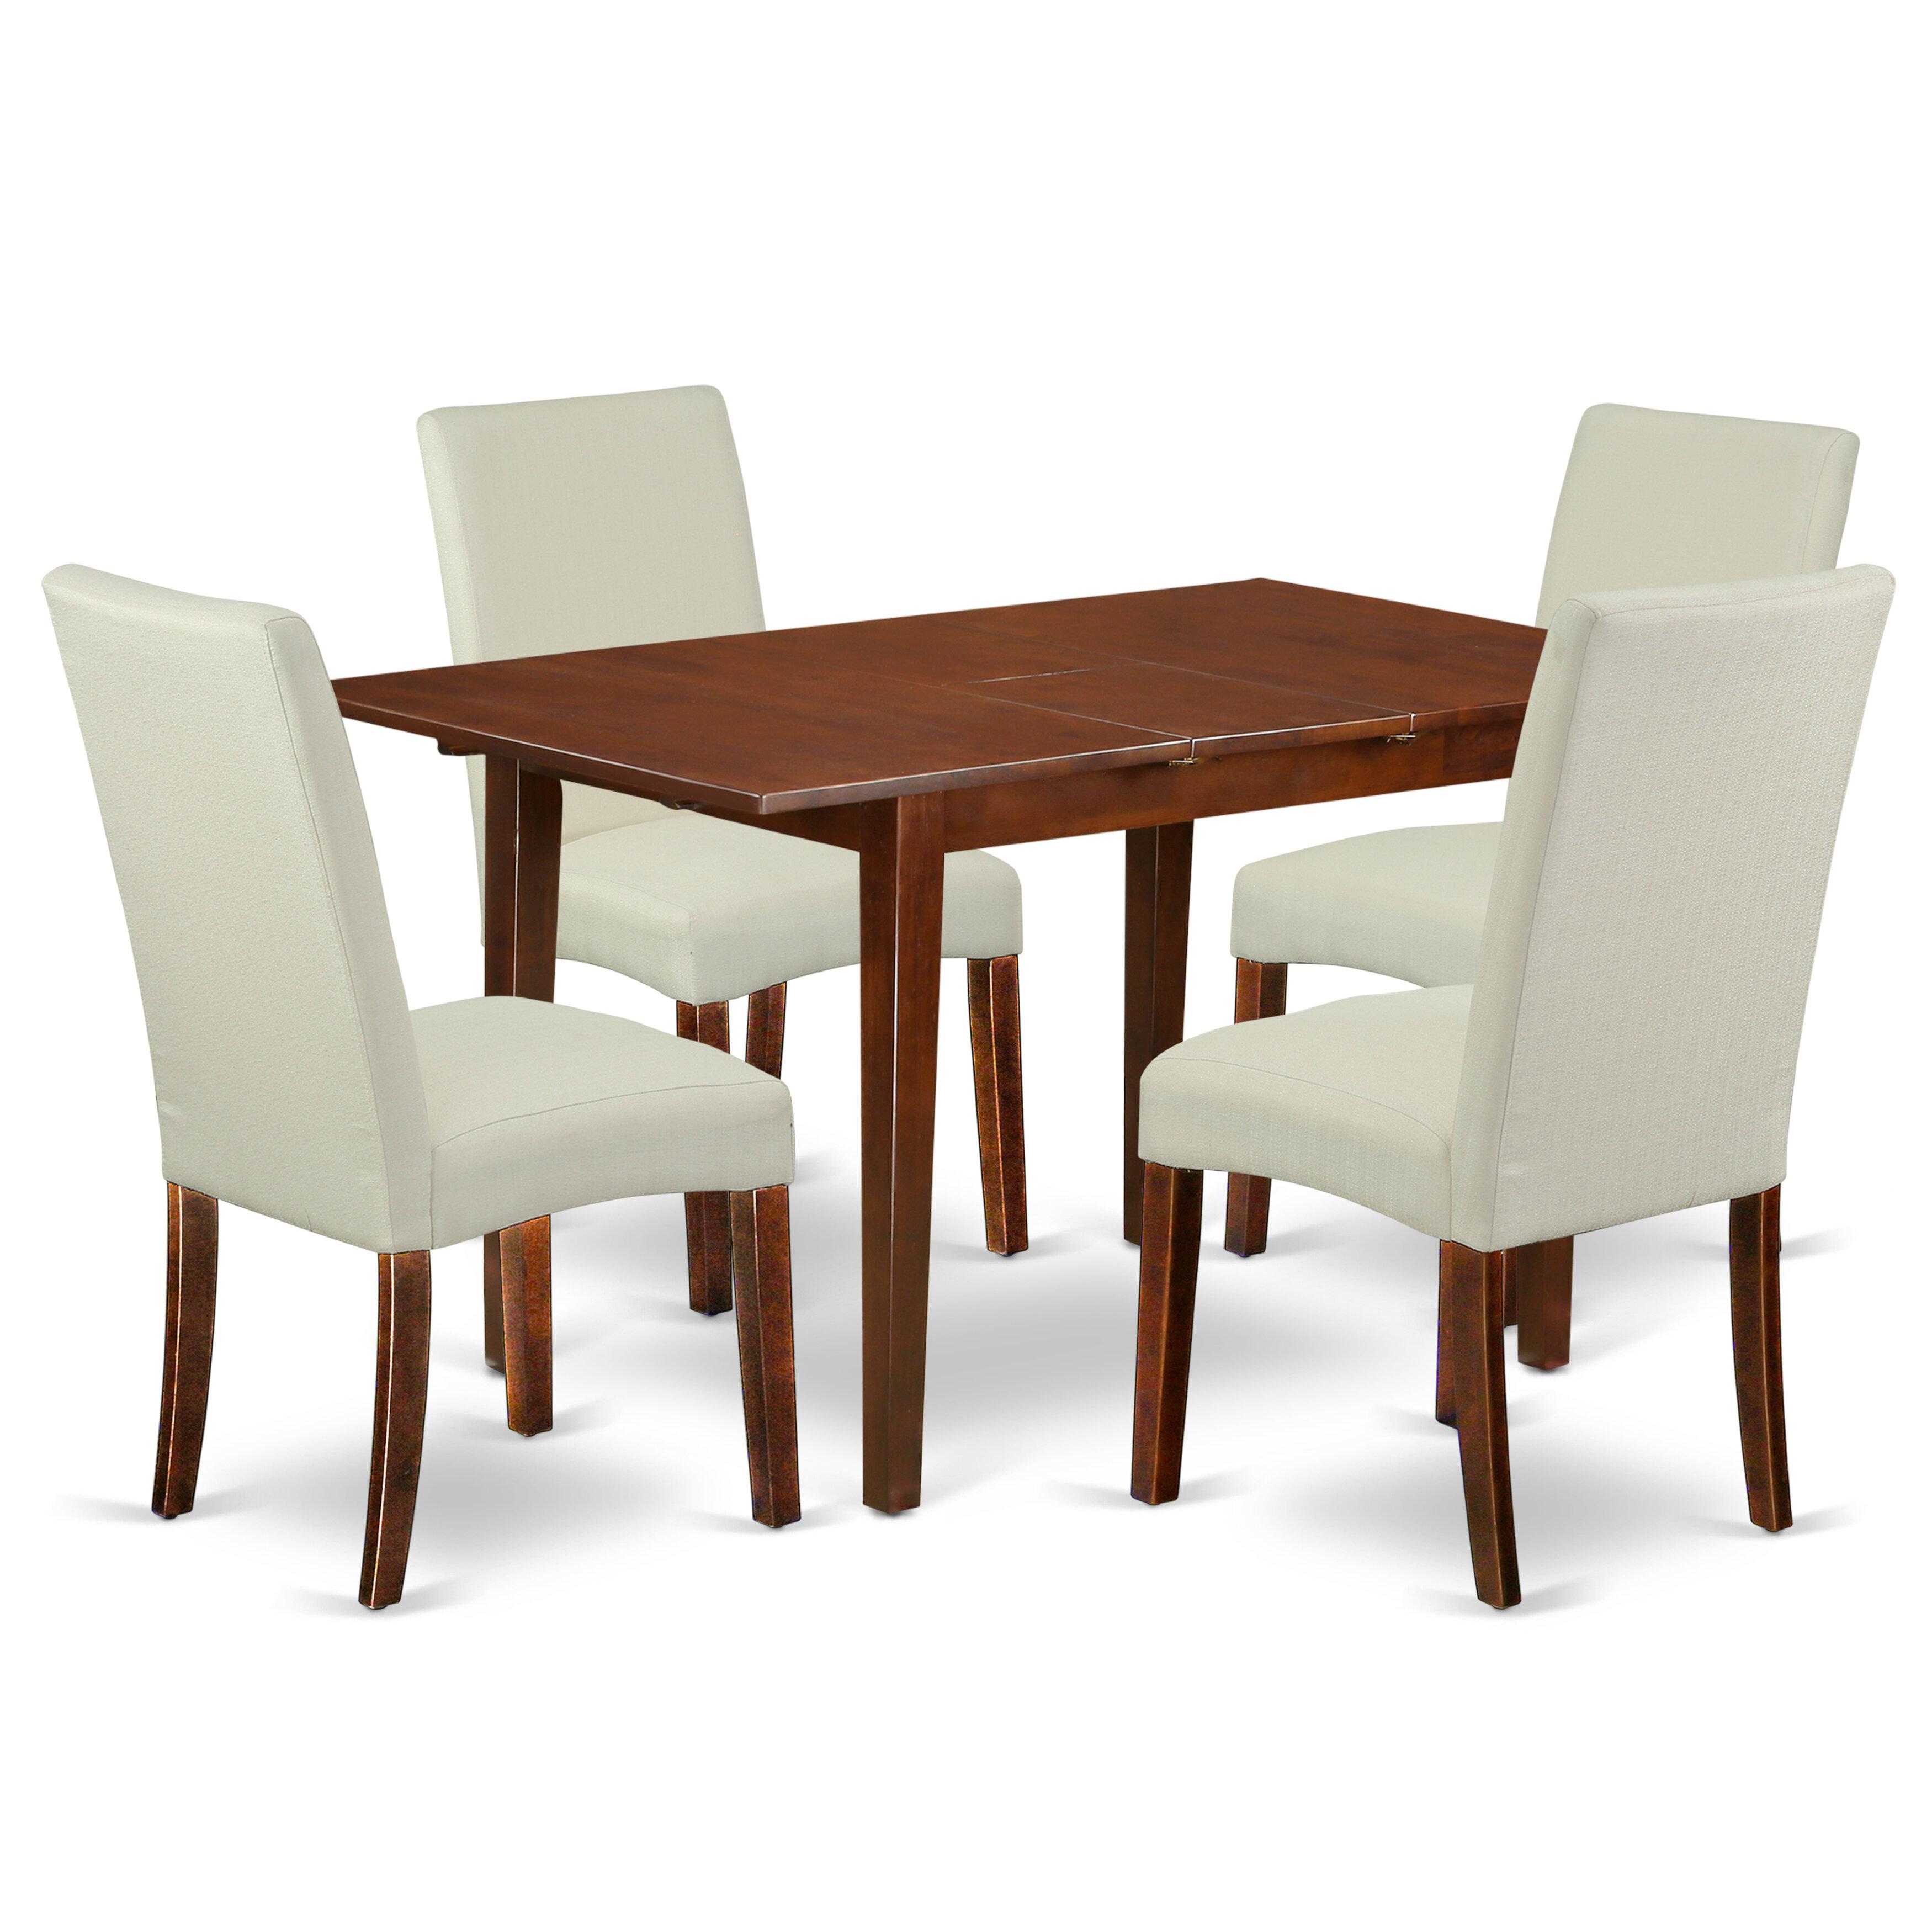 2x Dining Chairs Linen Fabric Cushion Padded Metal Legs Restaurant Tub Armchair